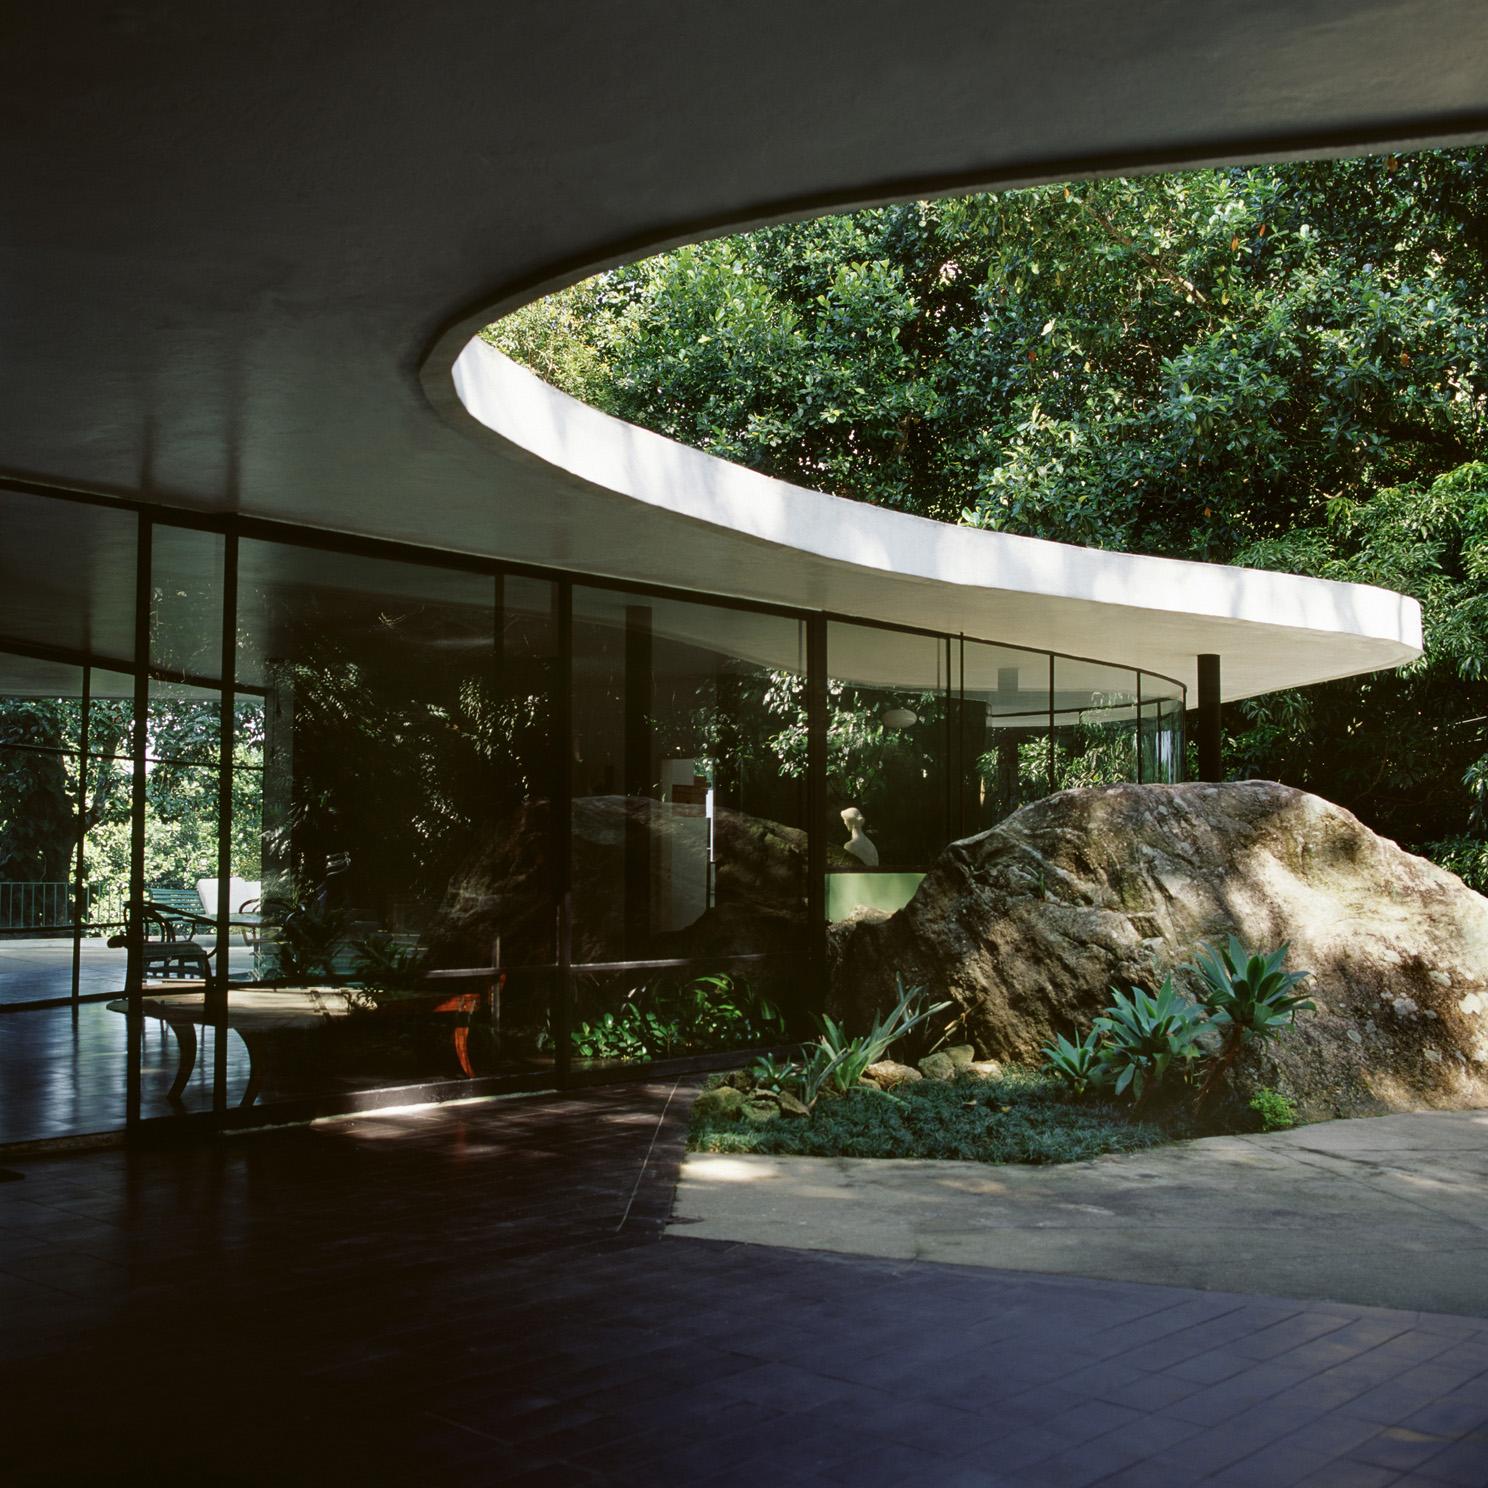 Kvmdlivespaces design casa das canoas por oscar niemeyer for Bo architecture 4 1